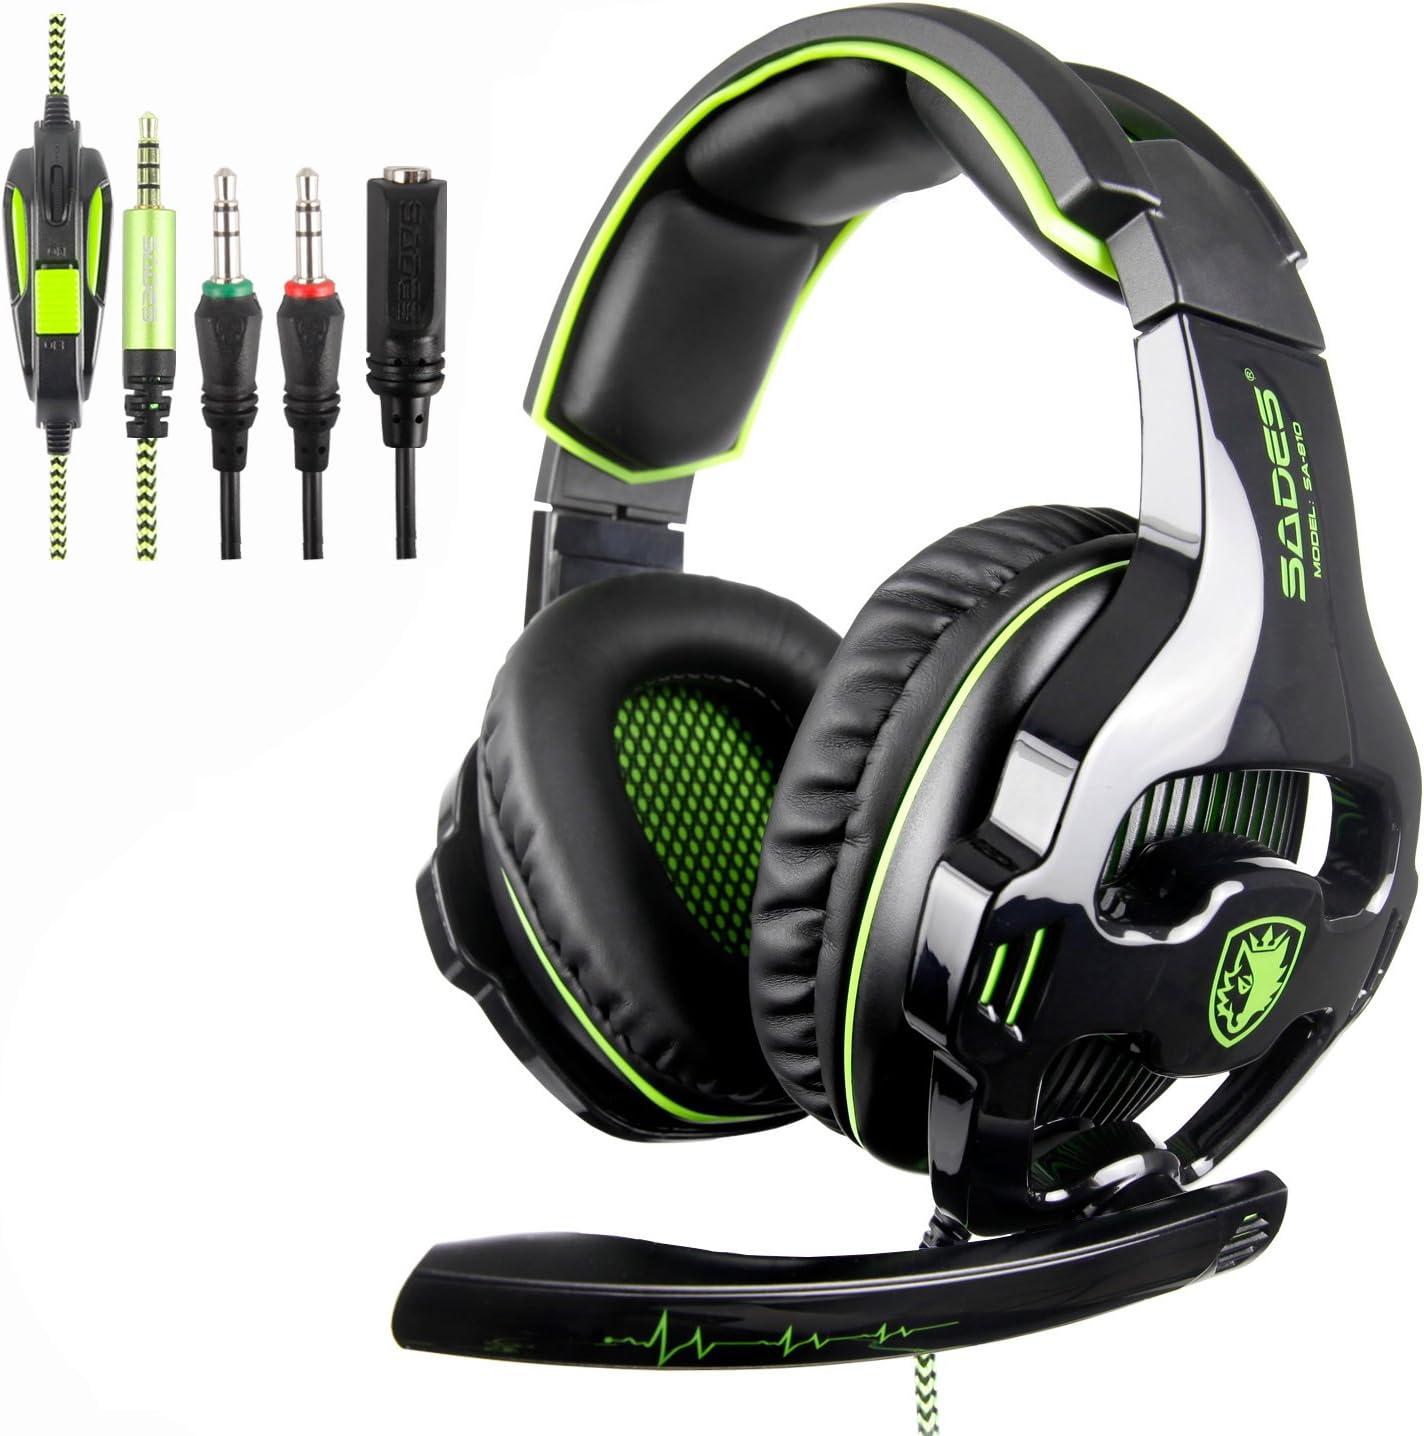 [nuevo revisado Versión] Sades 810s Stereo Gaming Headset Auriculares con compensación de volumen Mic para New Xbox One, PS4, PS4 Pro, PC, Laptop, Mac, Phone – Verde